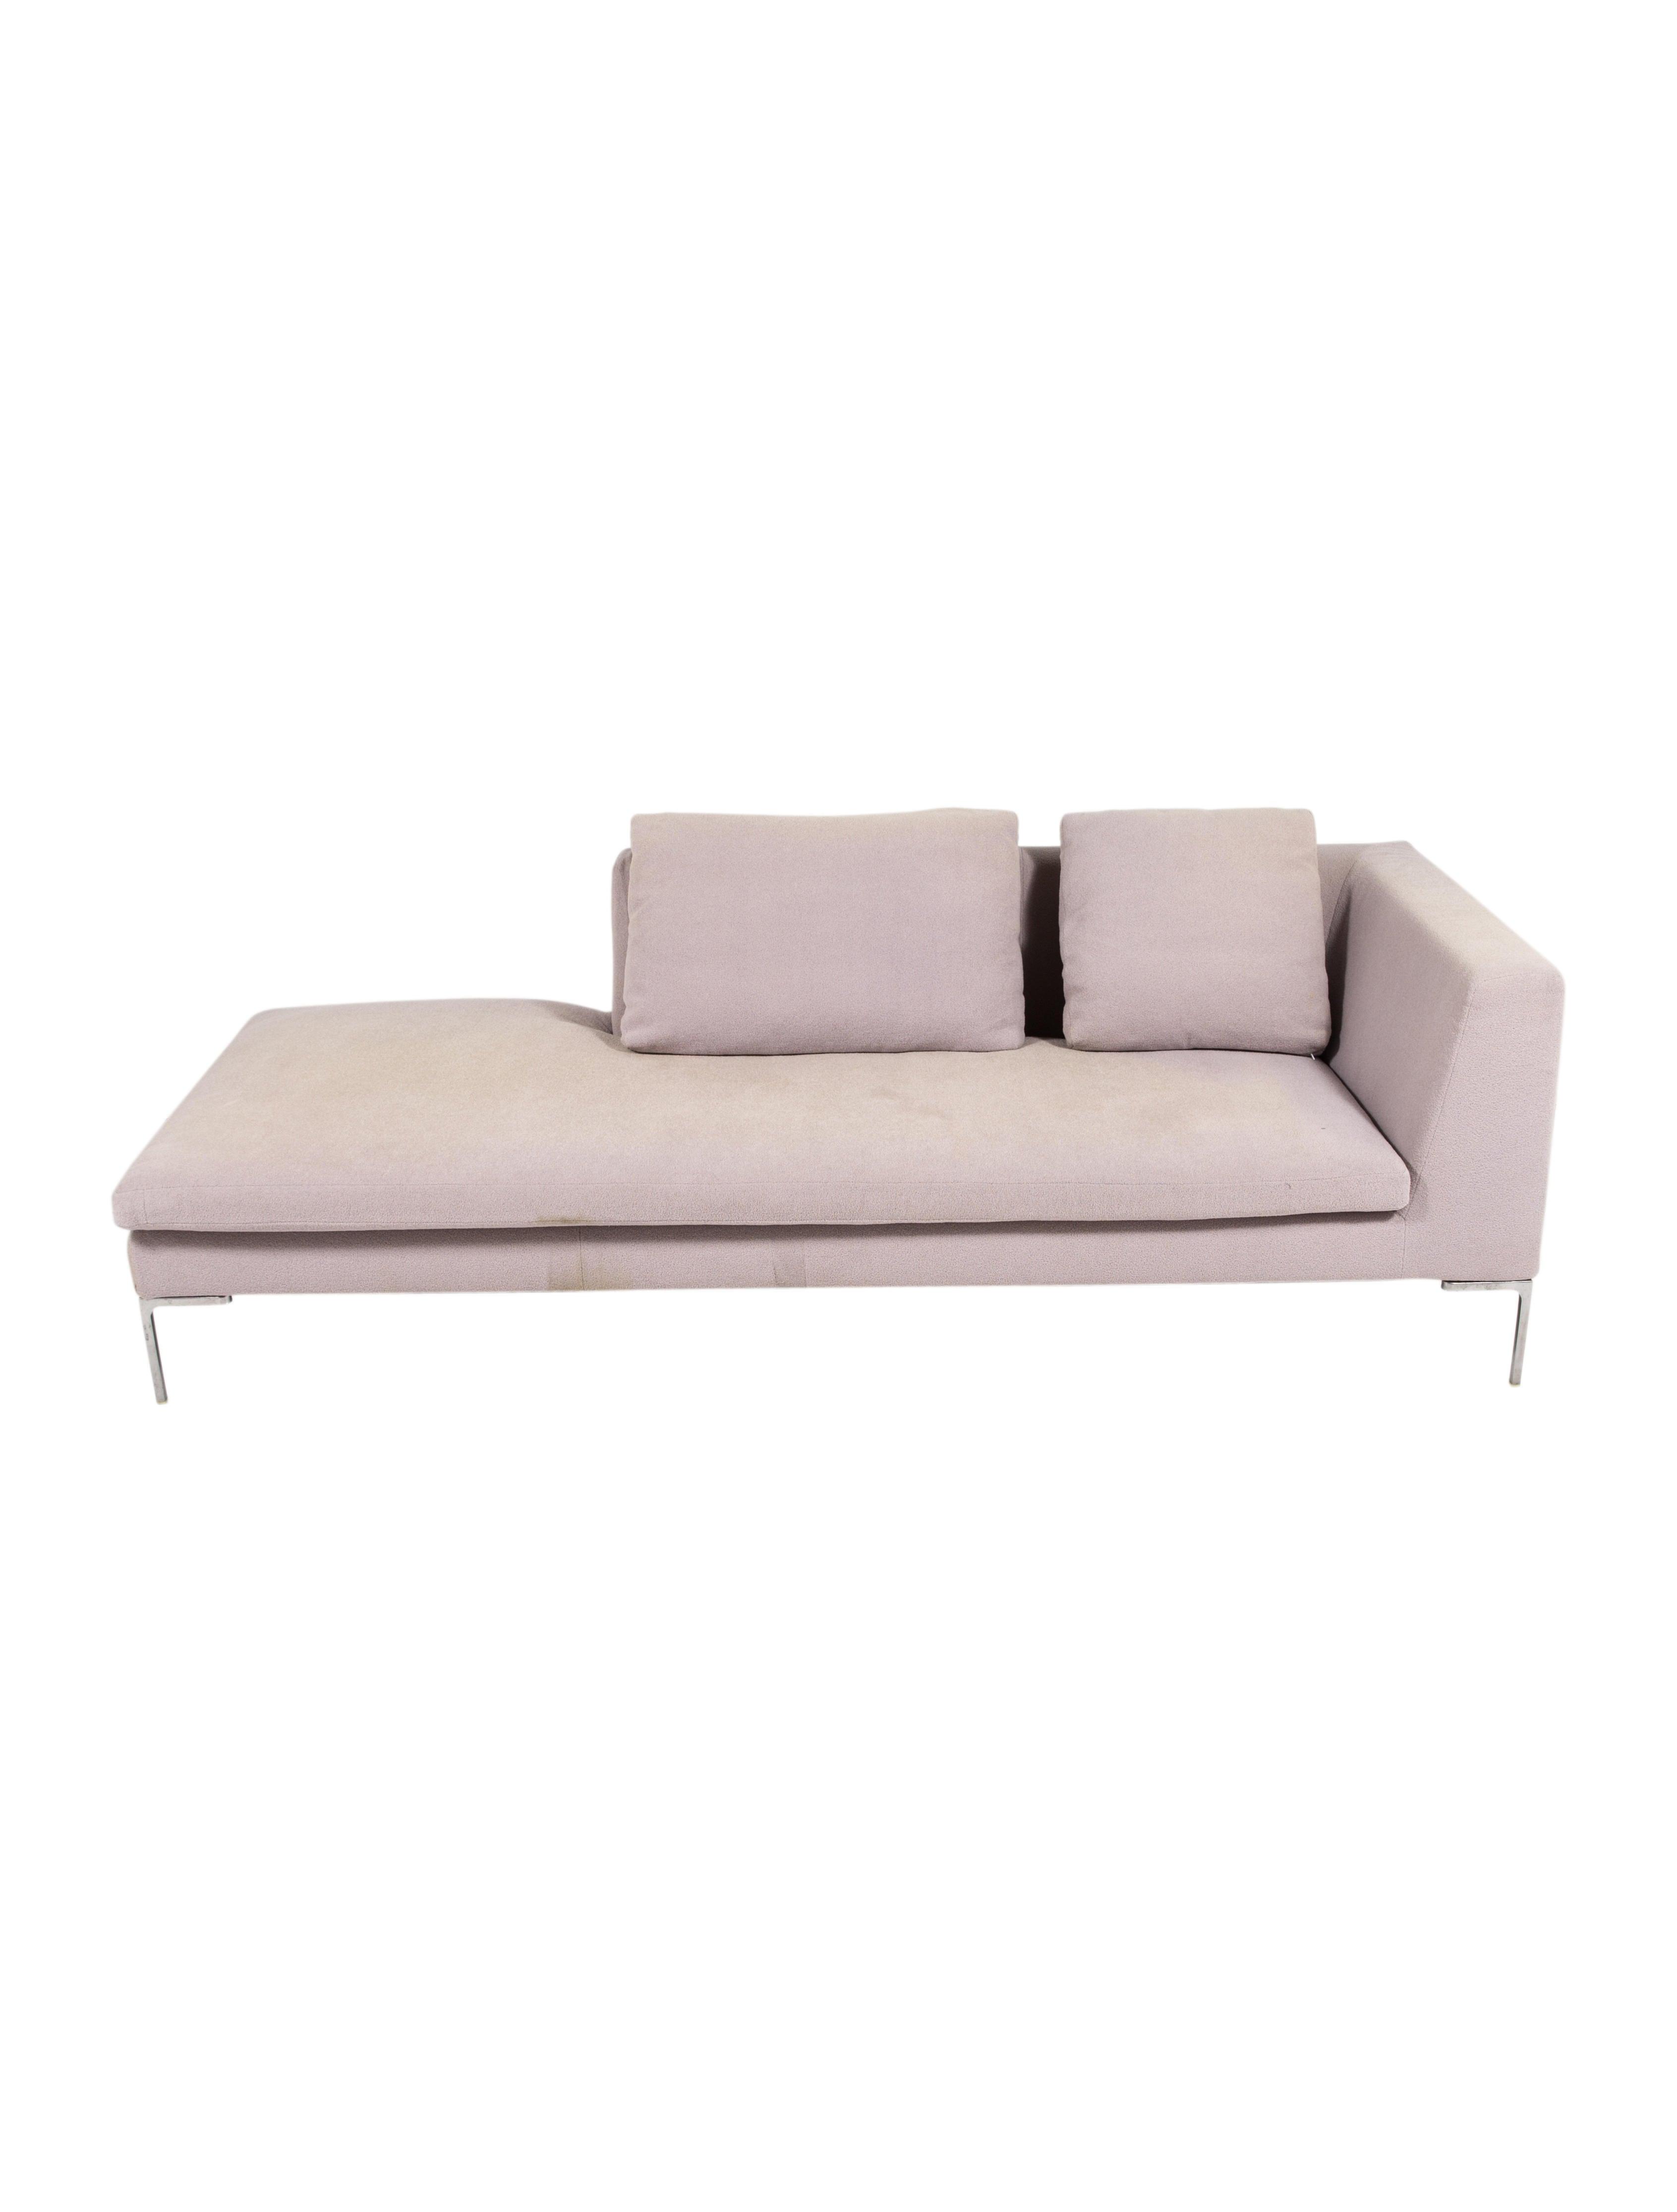 B B Italia Charles Sofa Furniture Bbi20057 The Realreal